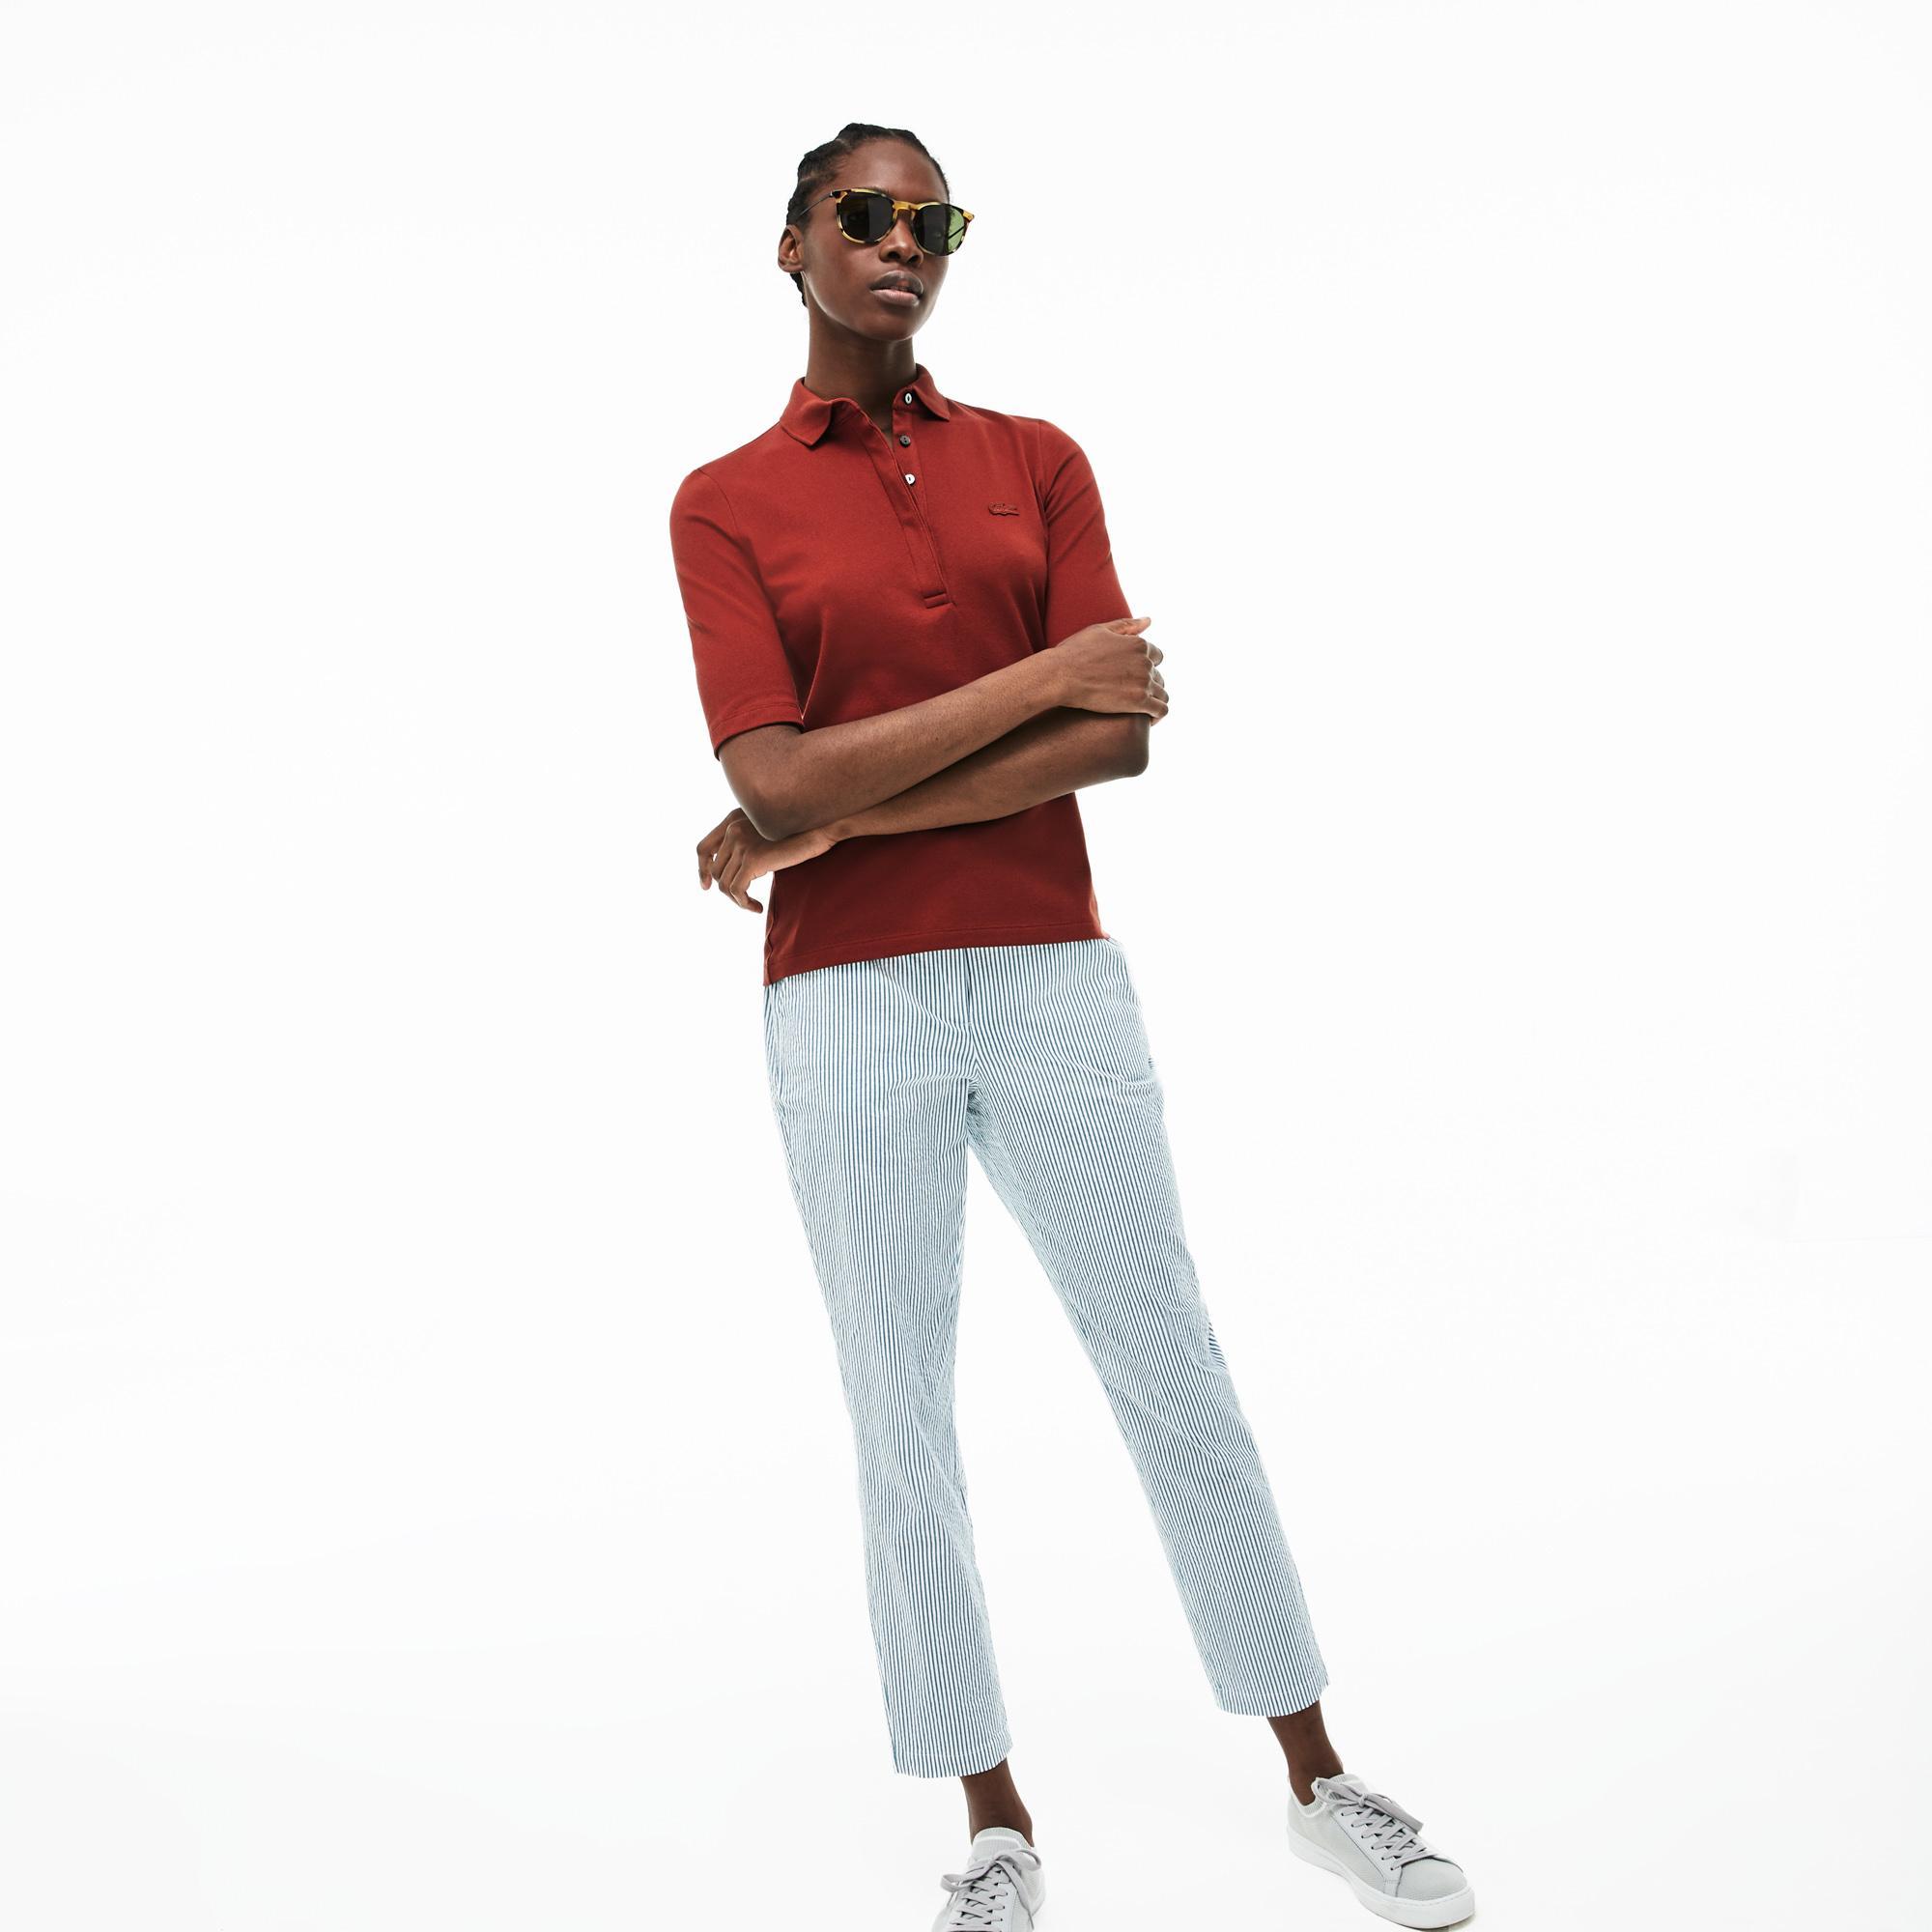 Lacoste Kadın Slim Fit Koyu Kiremit Polo